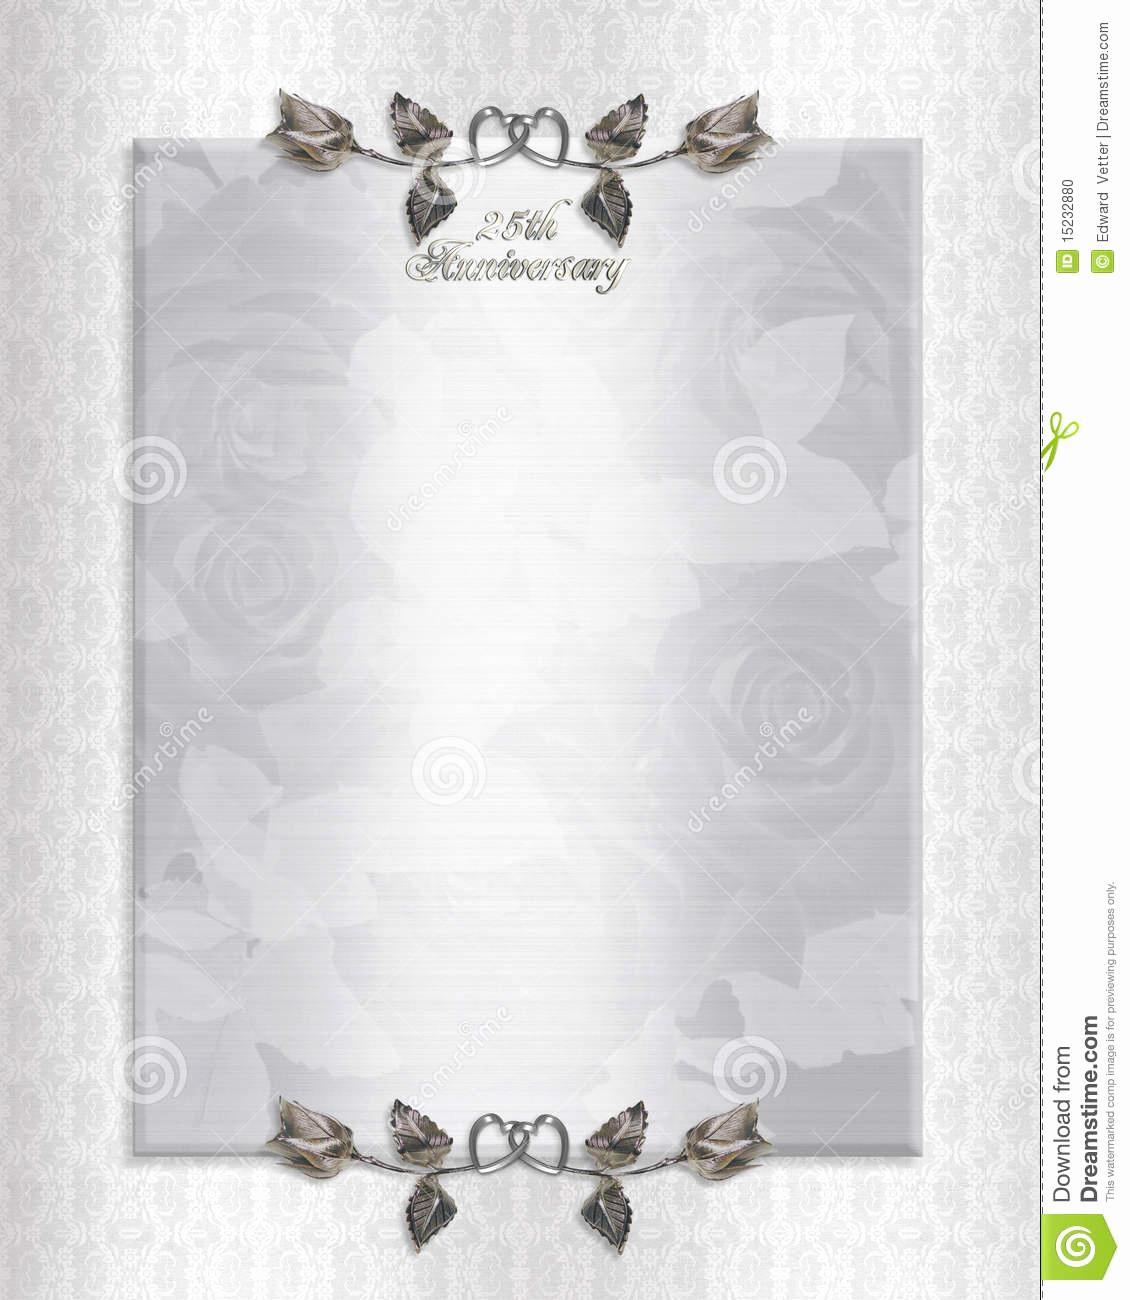 Free Anniversary Invitation Templates Lovely 25th Wedding Anniversary Invitations Templates